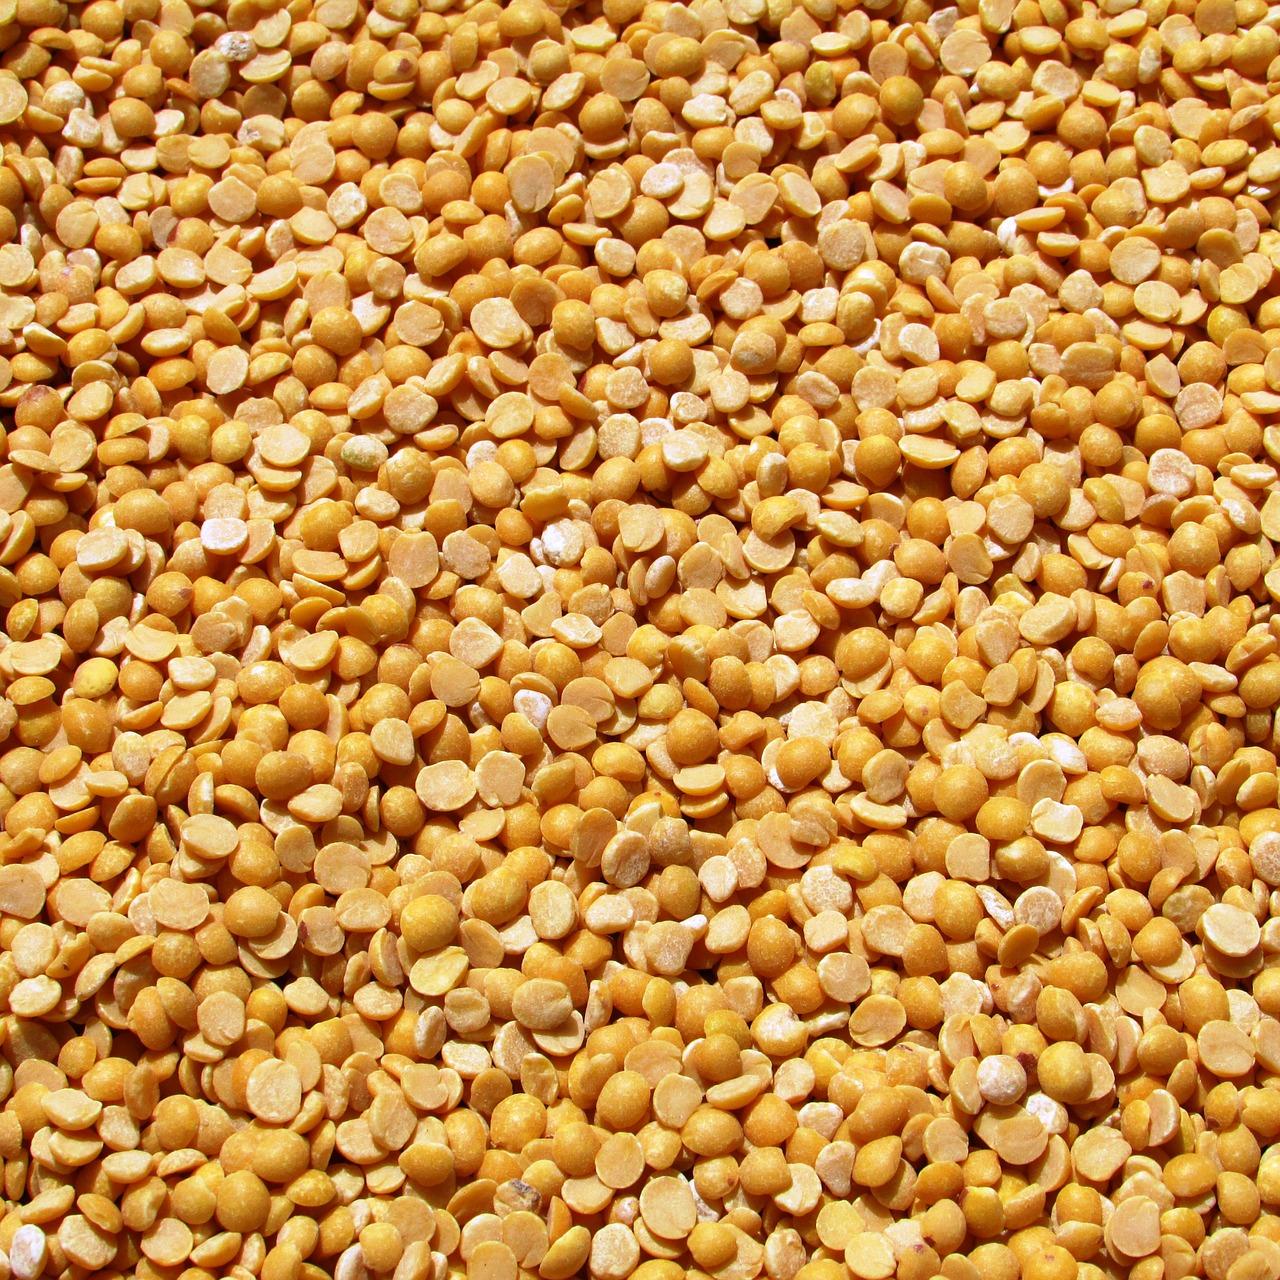 Yellow Split Peas | Vijayanarasimha pixabay.com